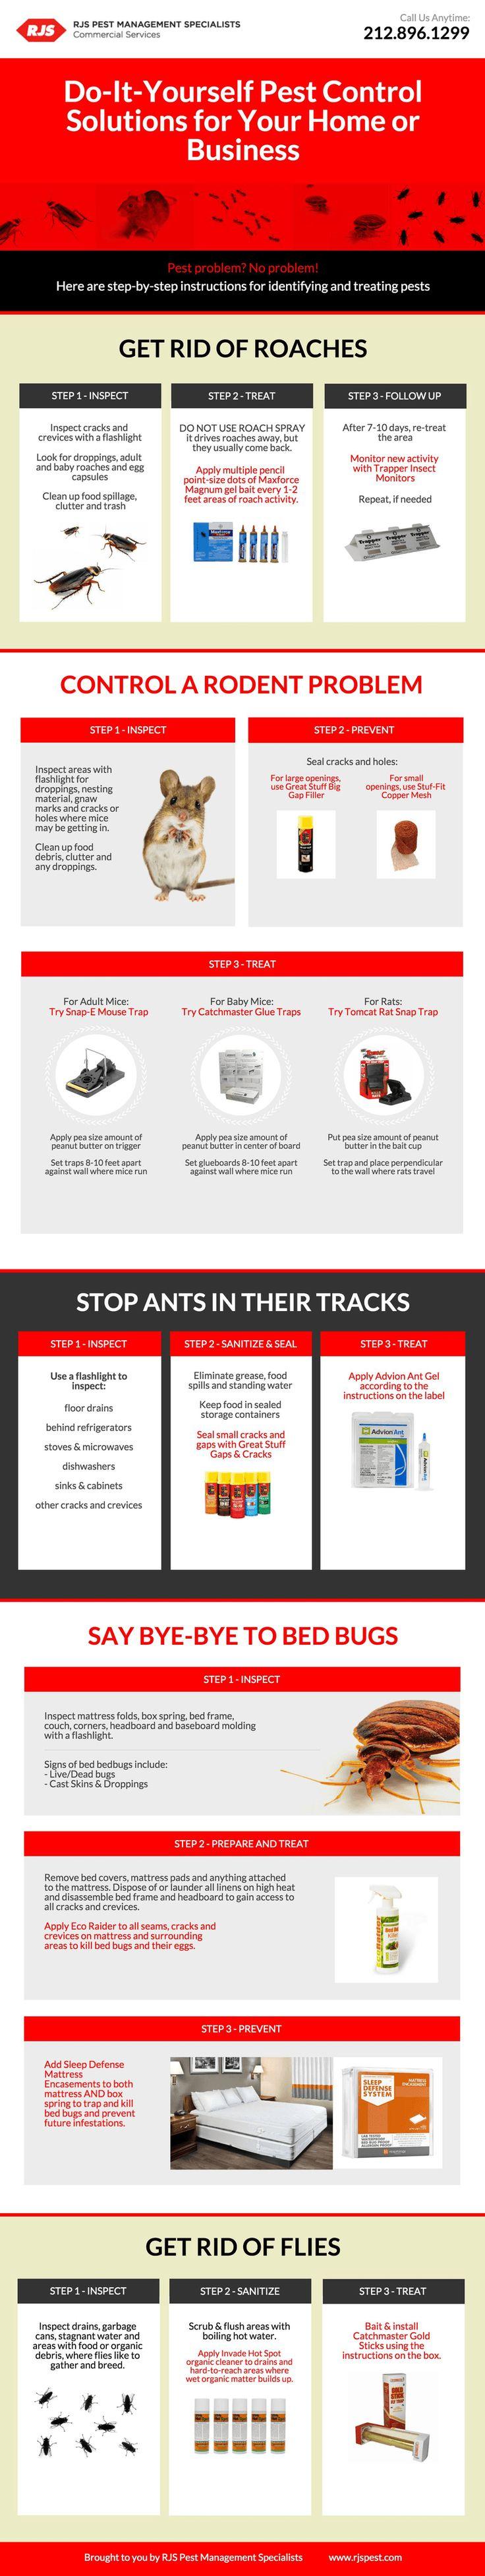 best Pest Control images on Pinterest